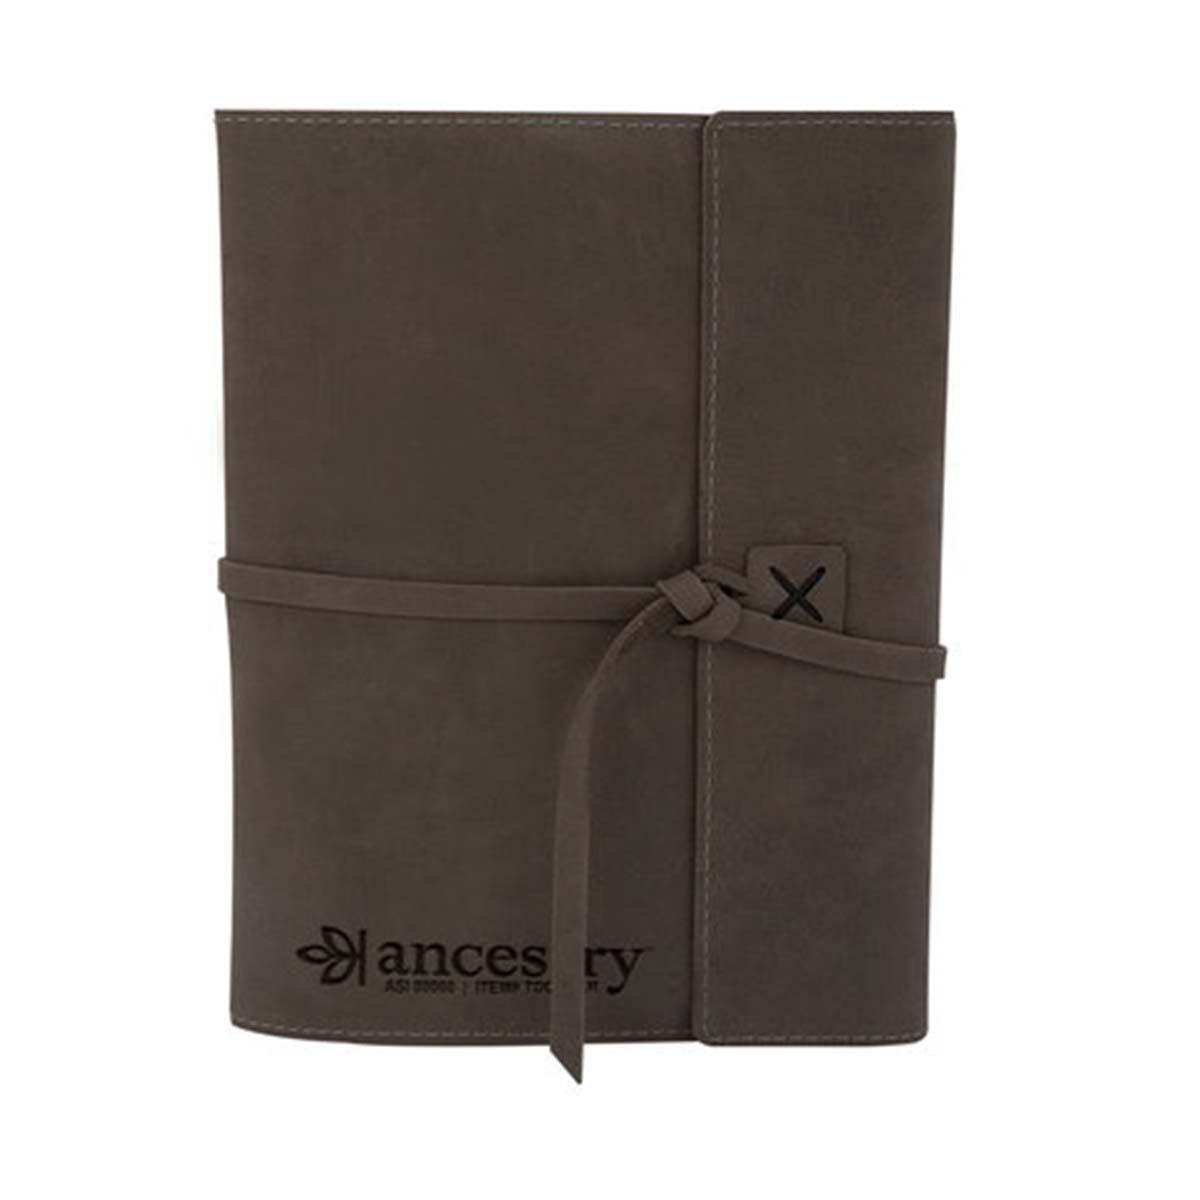 Snugz compositionbook gray